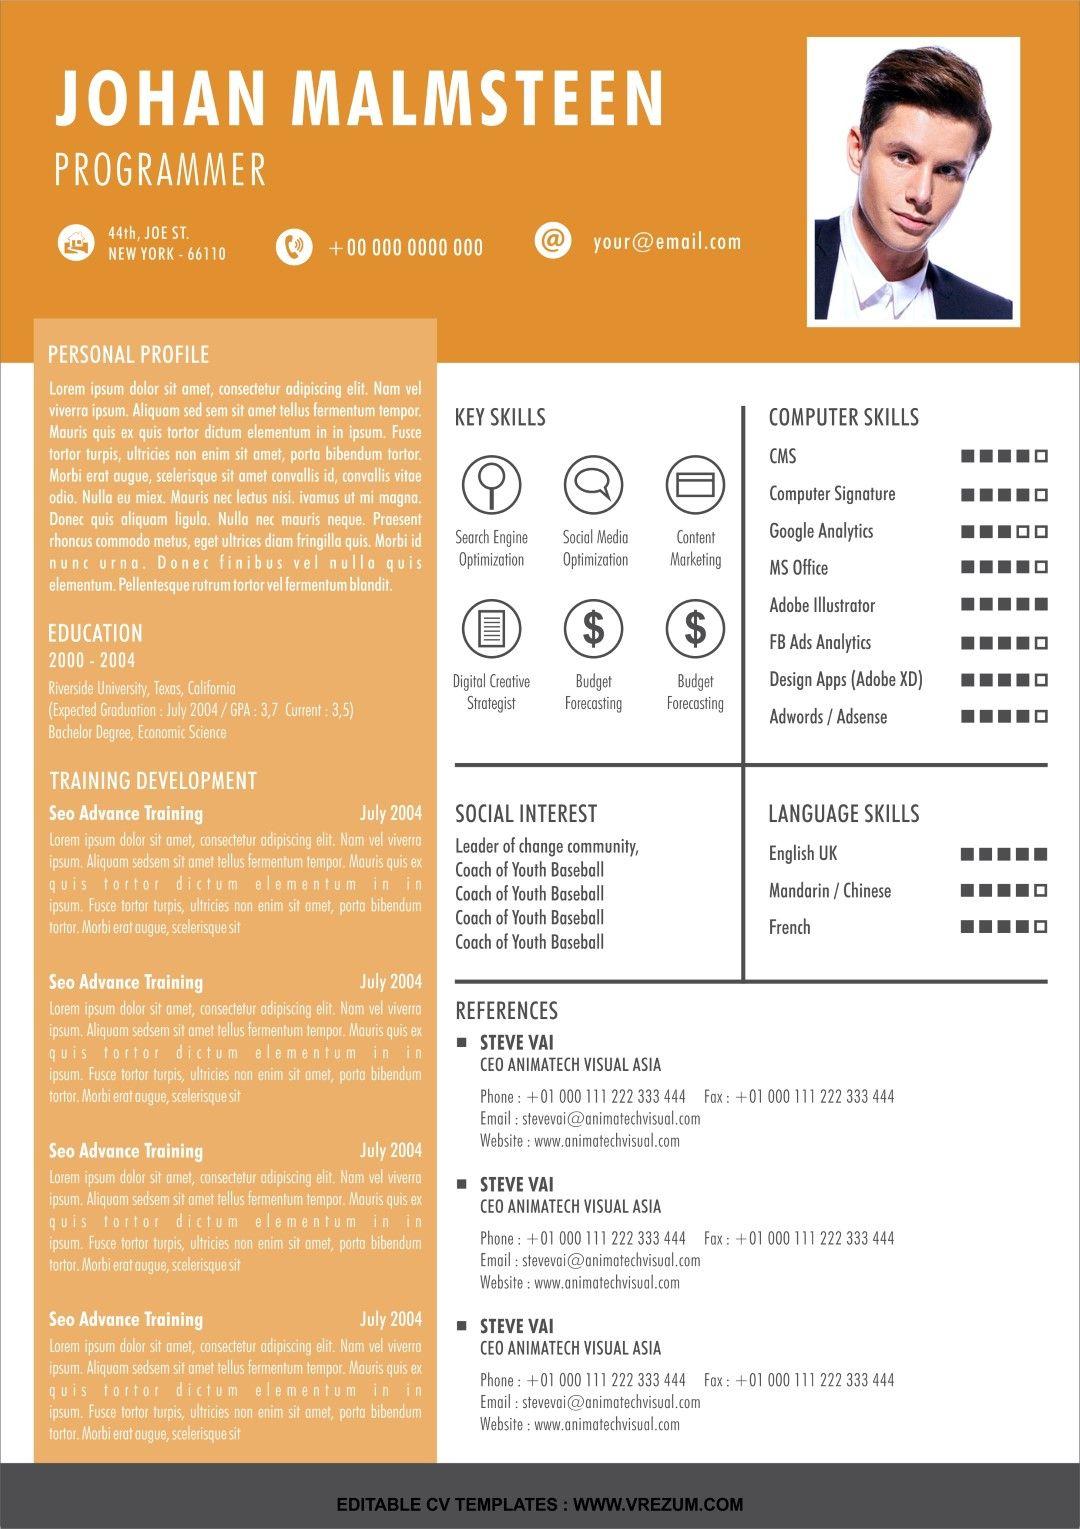 (EDITABLE) FREE CV Templates For Programmer in 2020 Cv